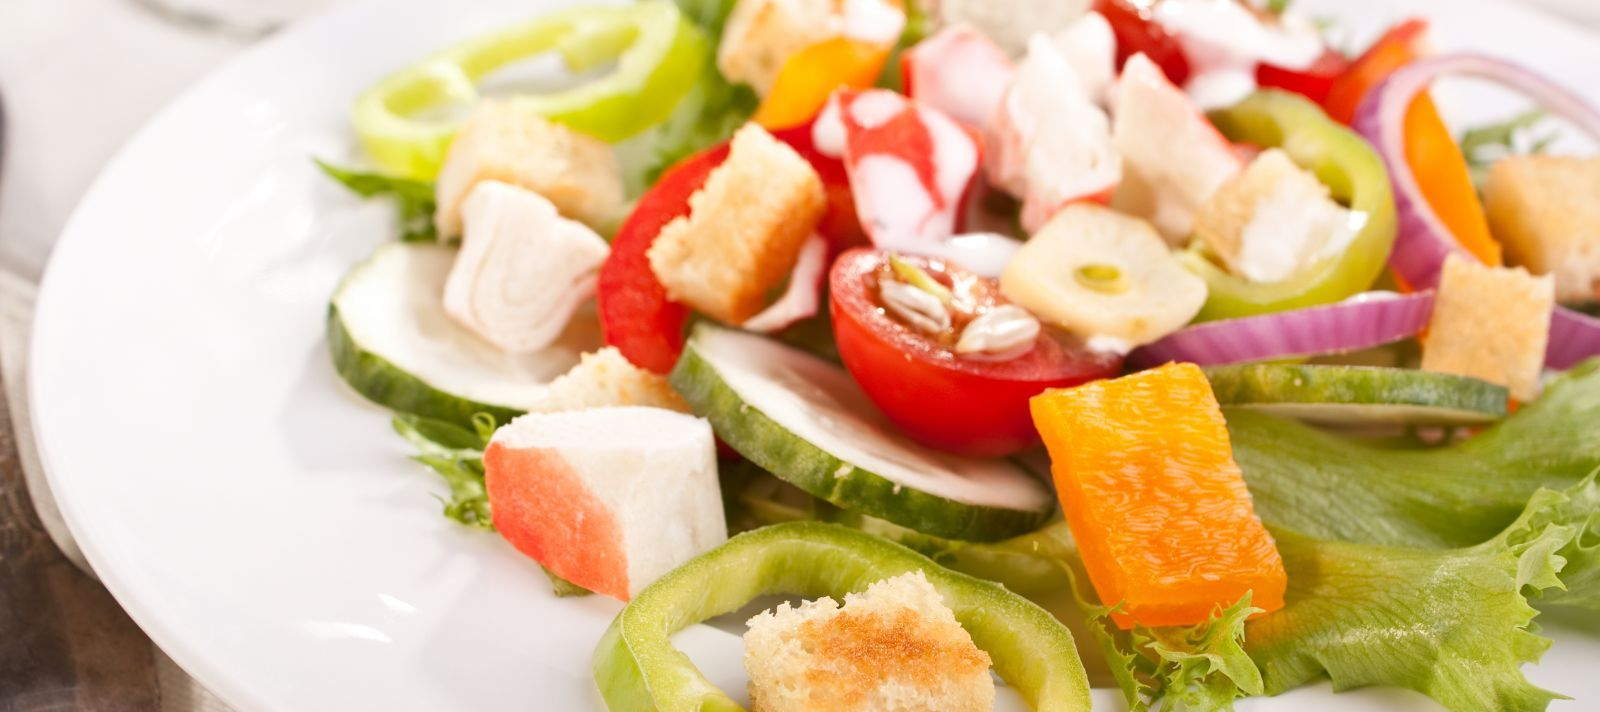 salade-coloree-surimi-meli-melo-fruits-legumes-fleury-michon-marmiton-recette